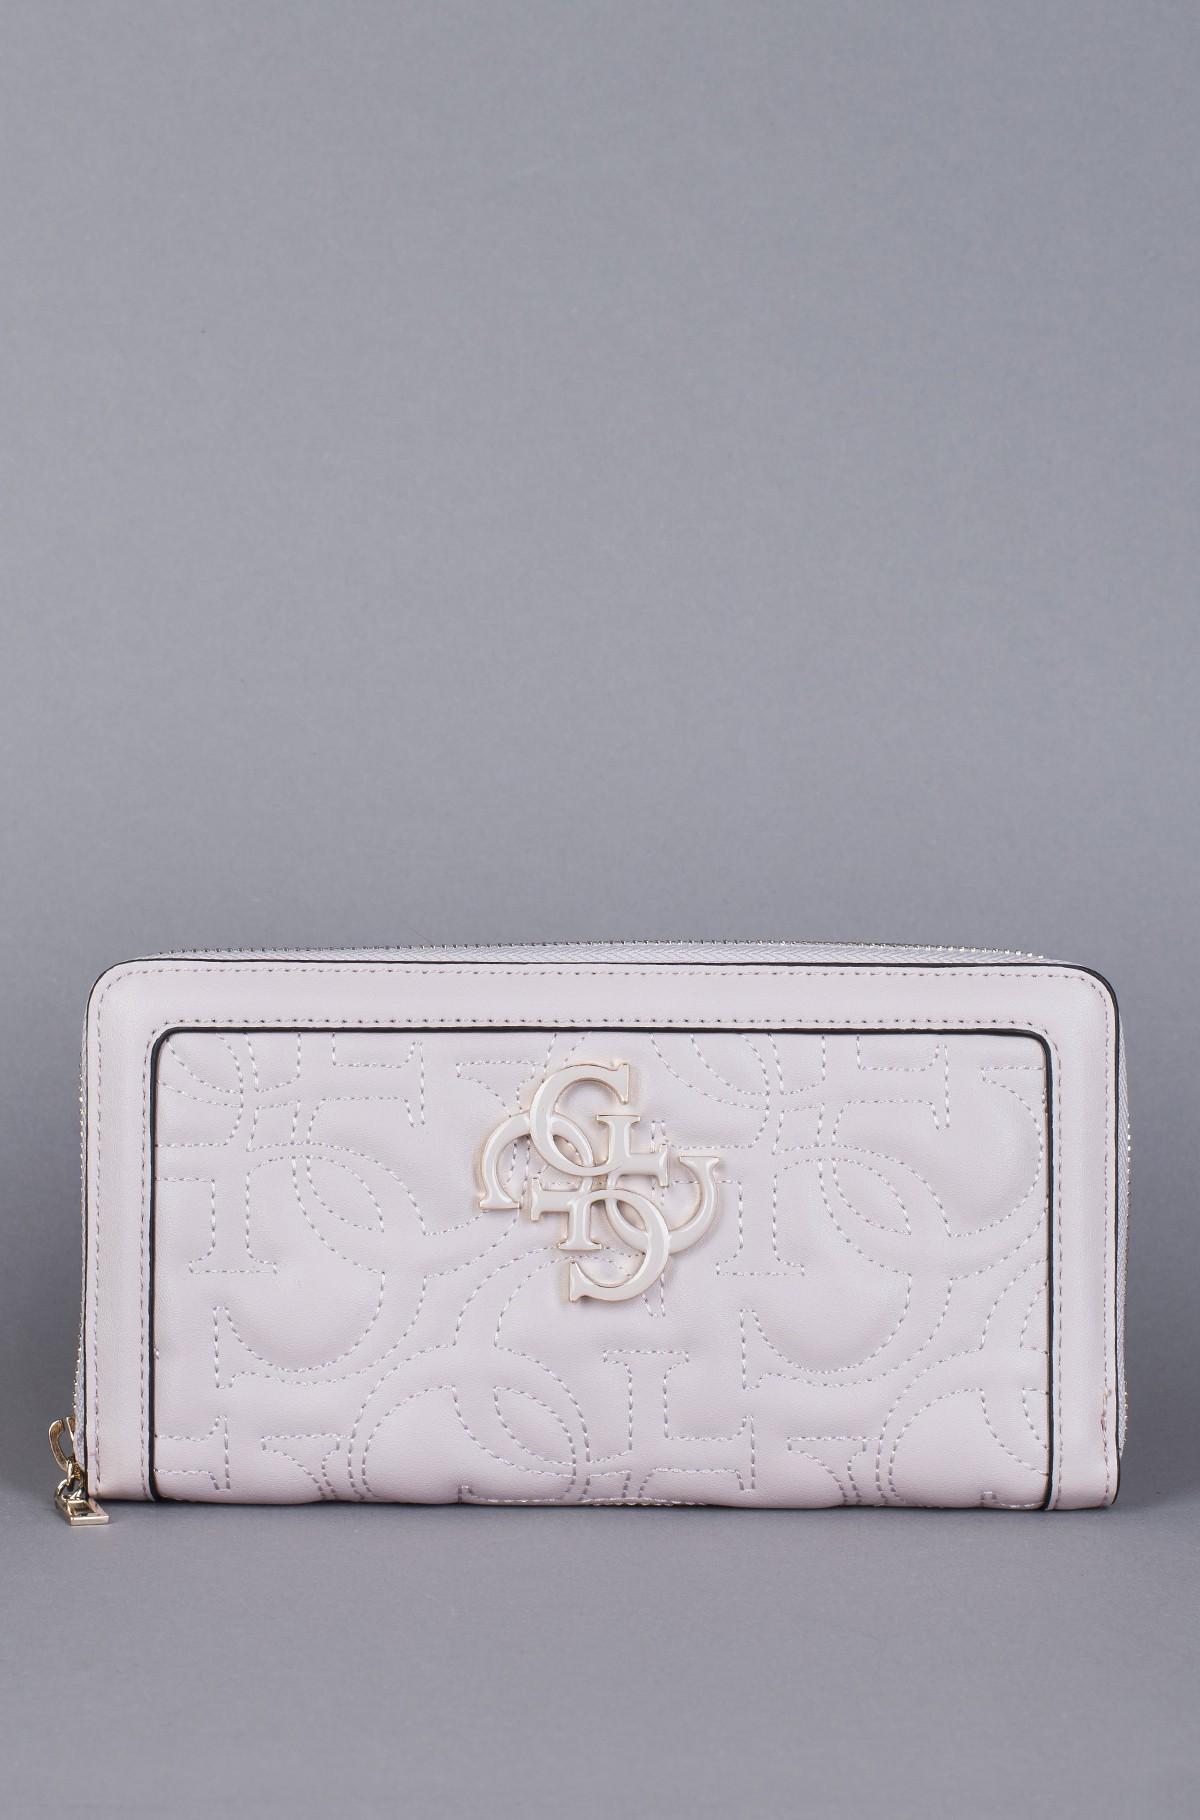 Wallet SWVG74 75630-full-1